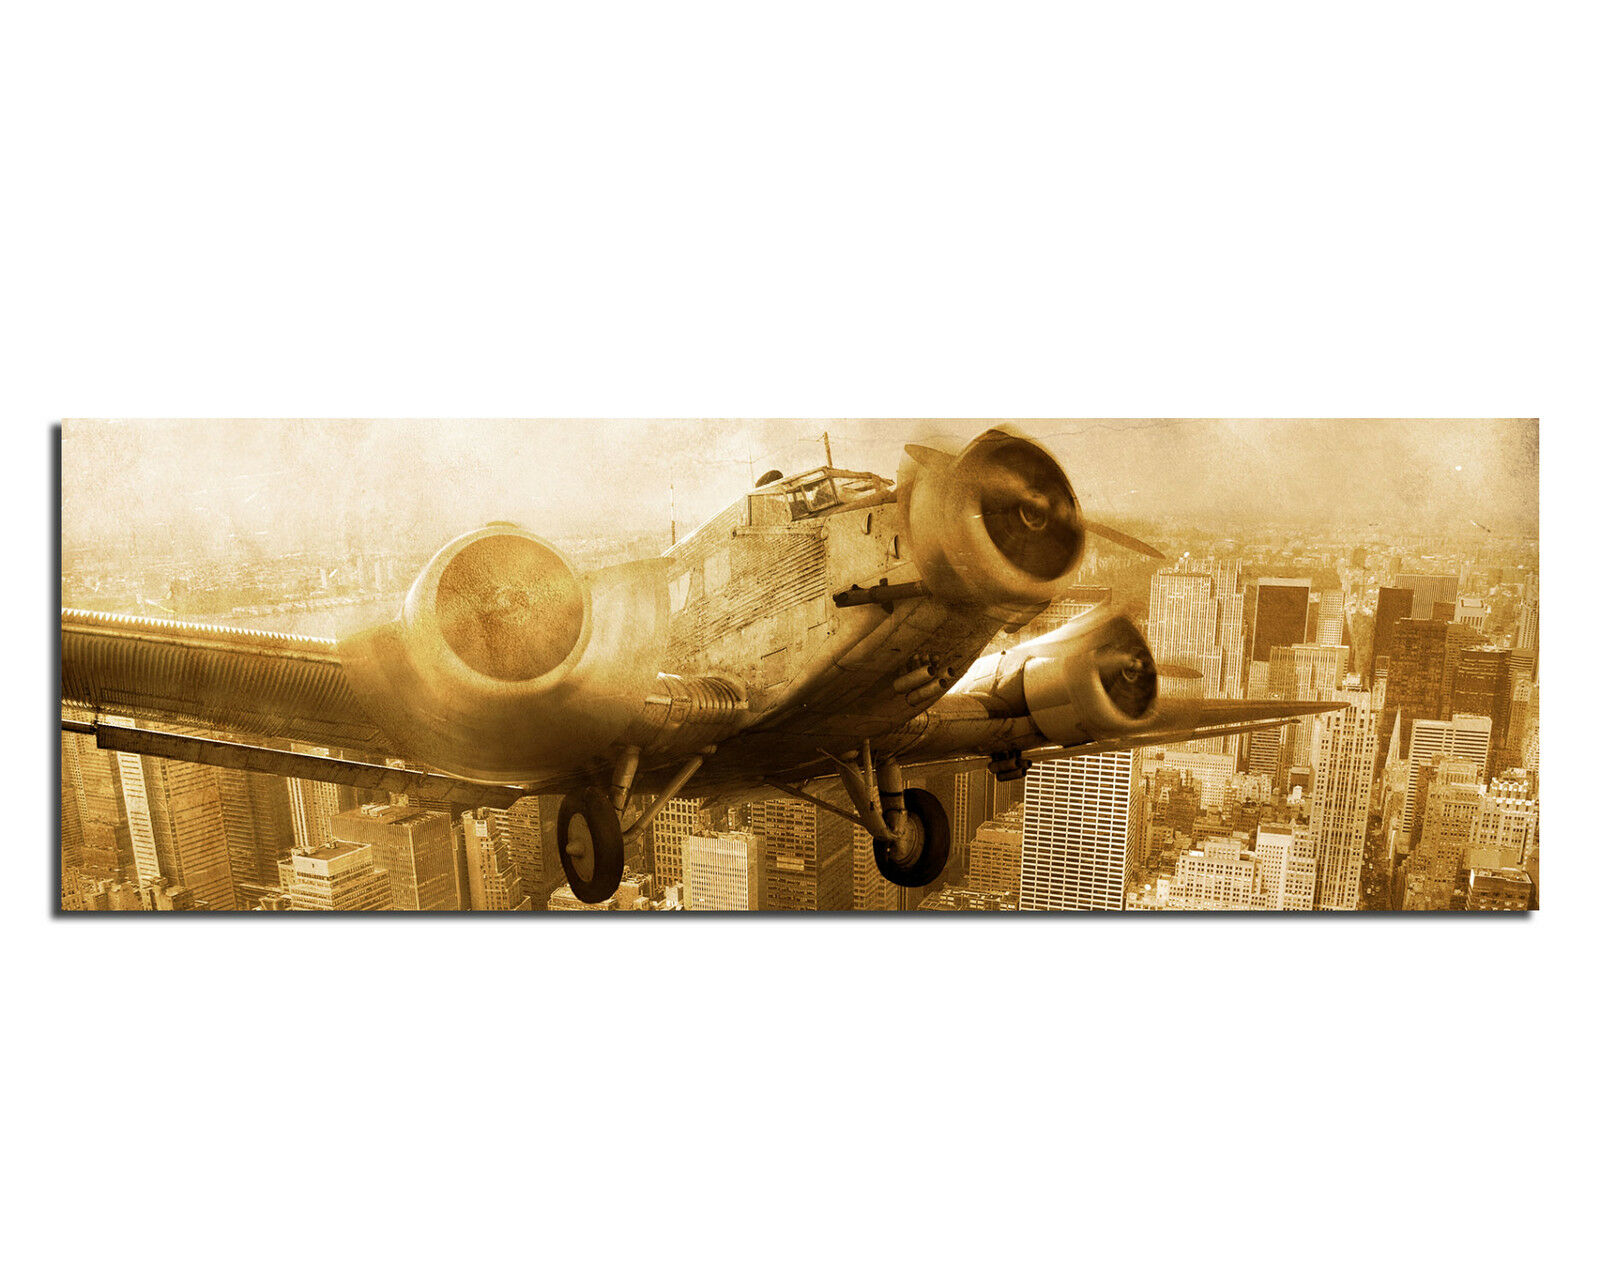 Wandbild Leinwand Bild Bilder Junkers 52 Flugzeug New York Wolkenkratzer Skyline